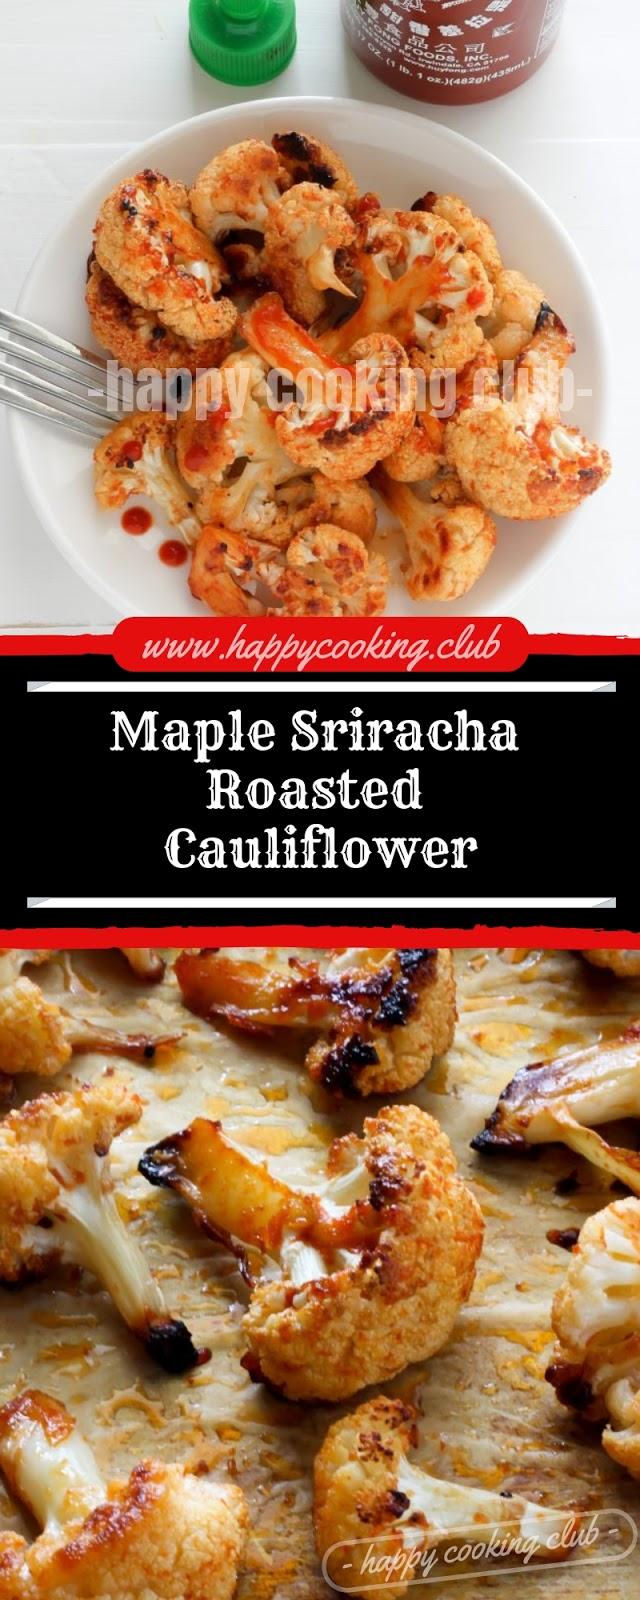 Maple Sriracha Roasted Cauliflower